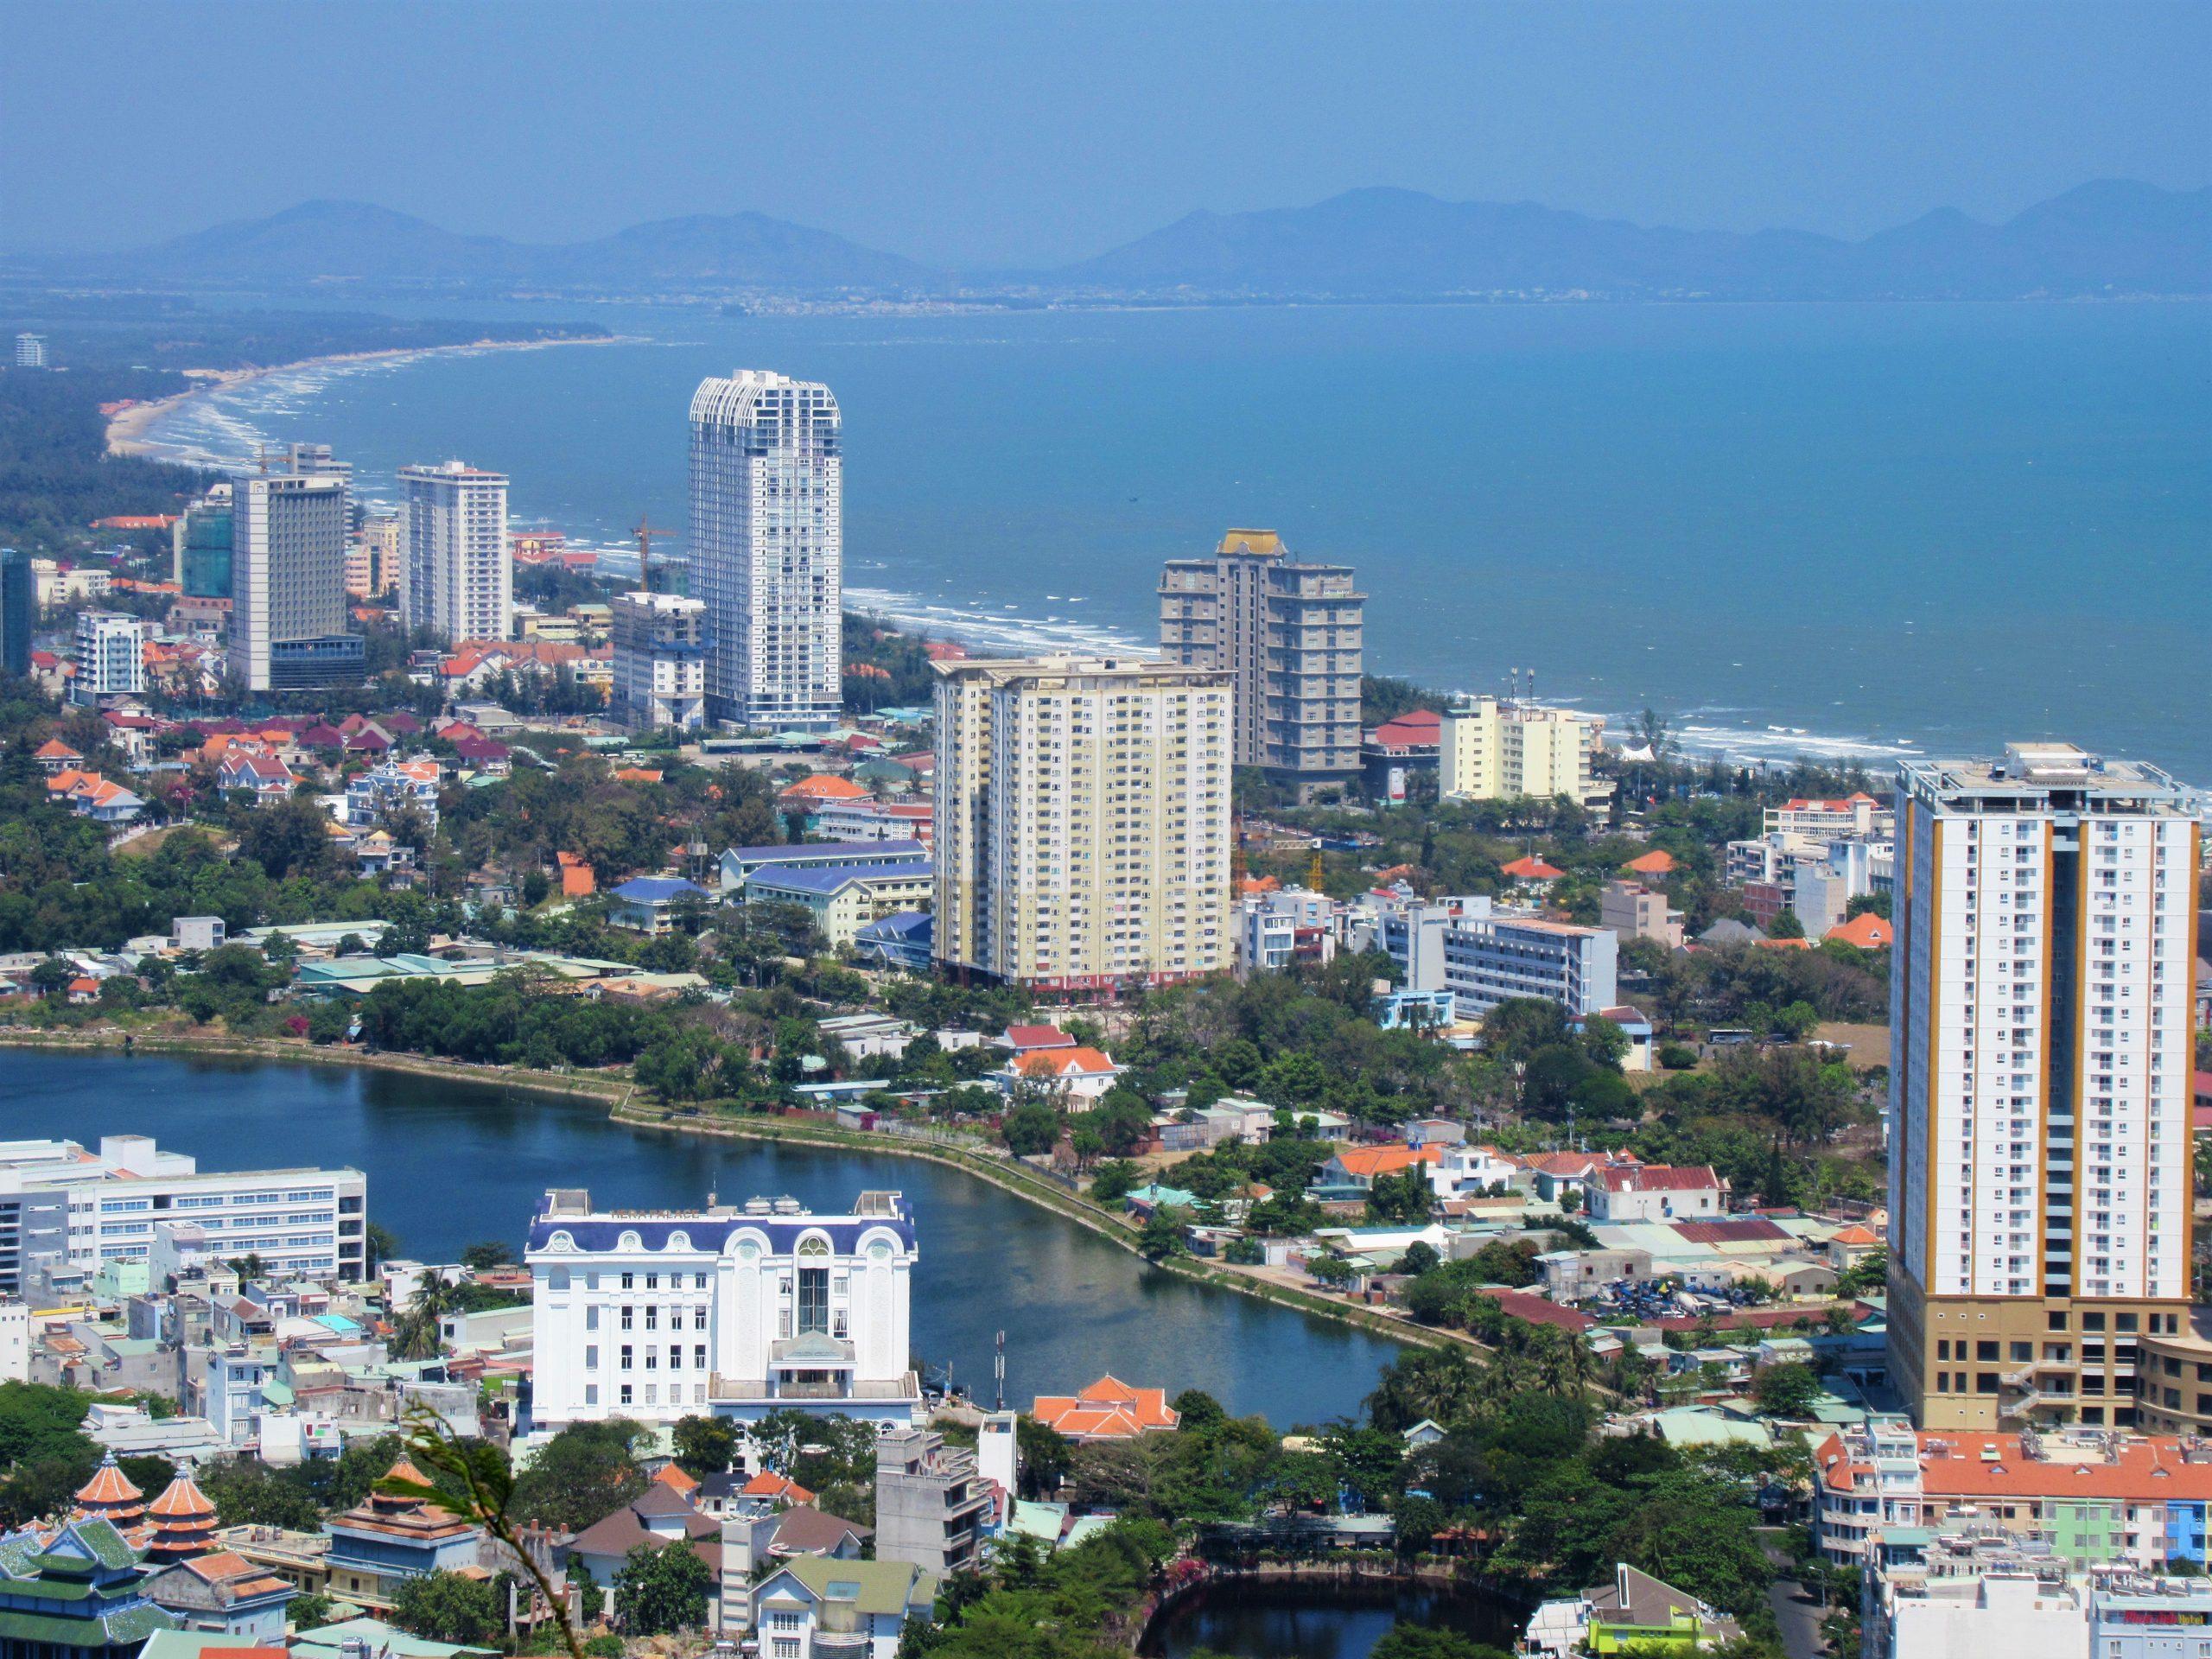 Vung Tau, Bãu Sau Beach, Vietnam